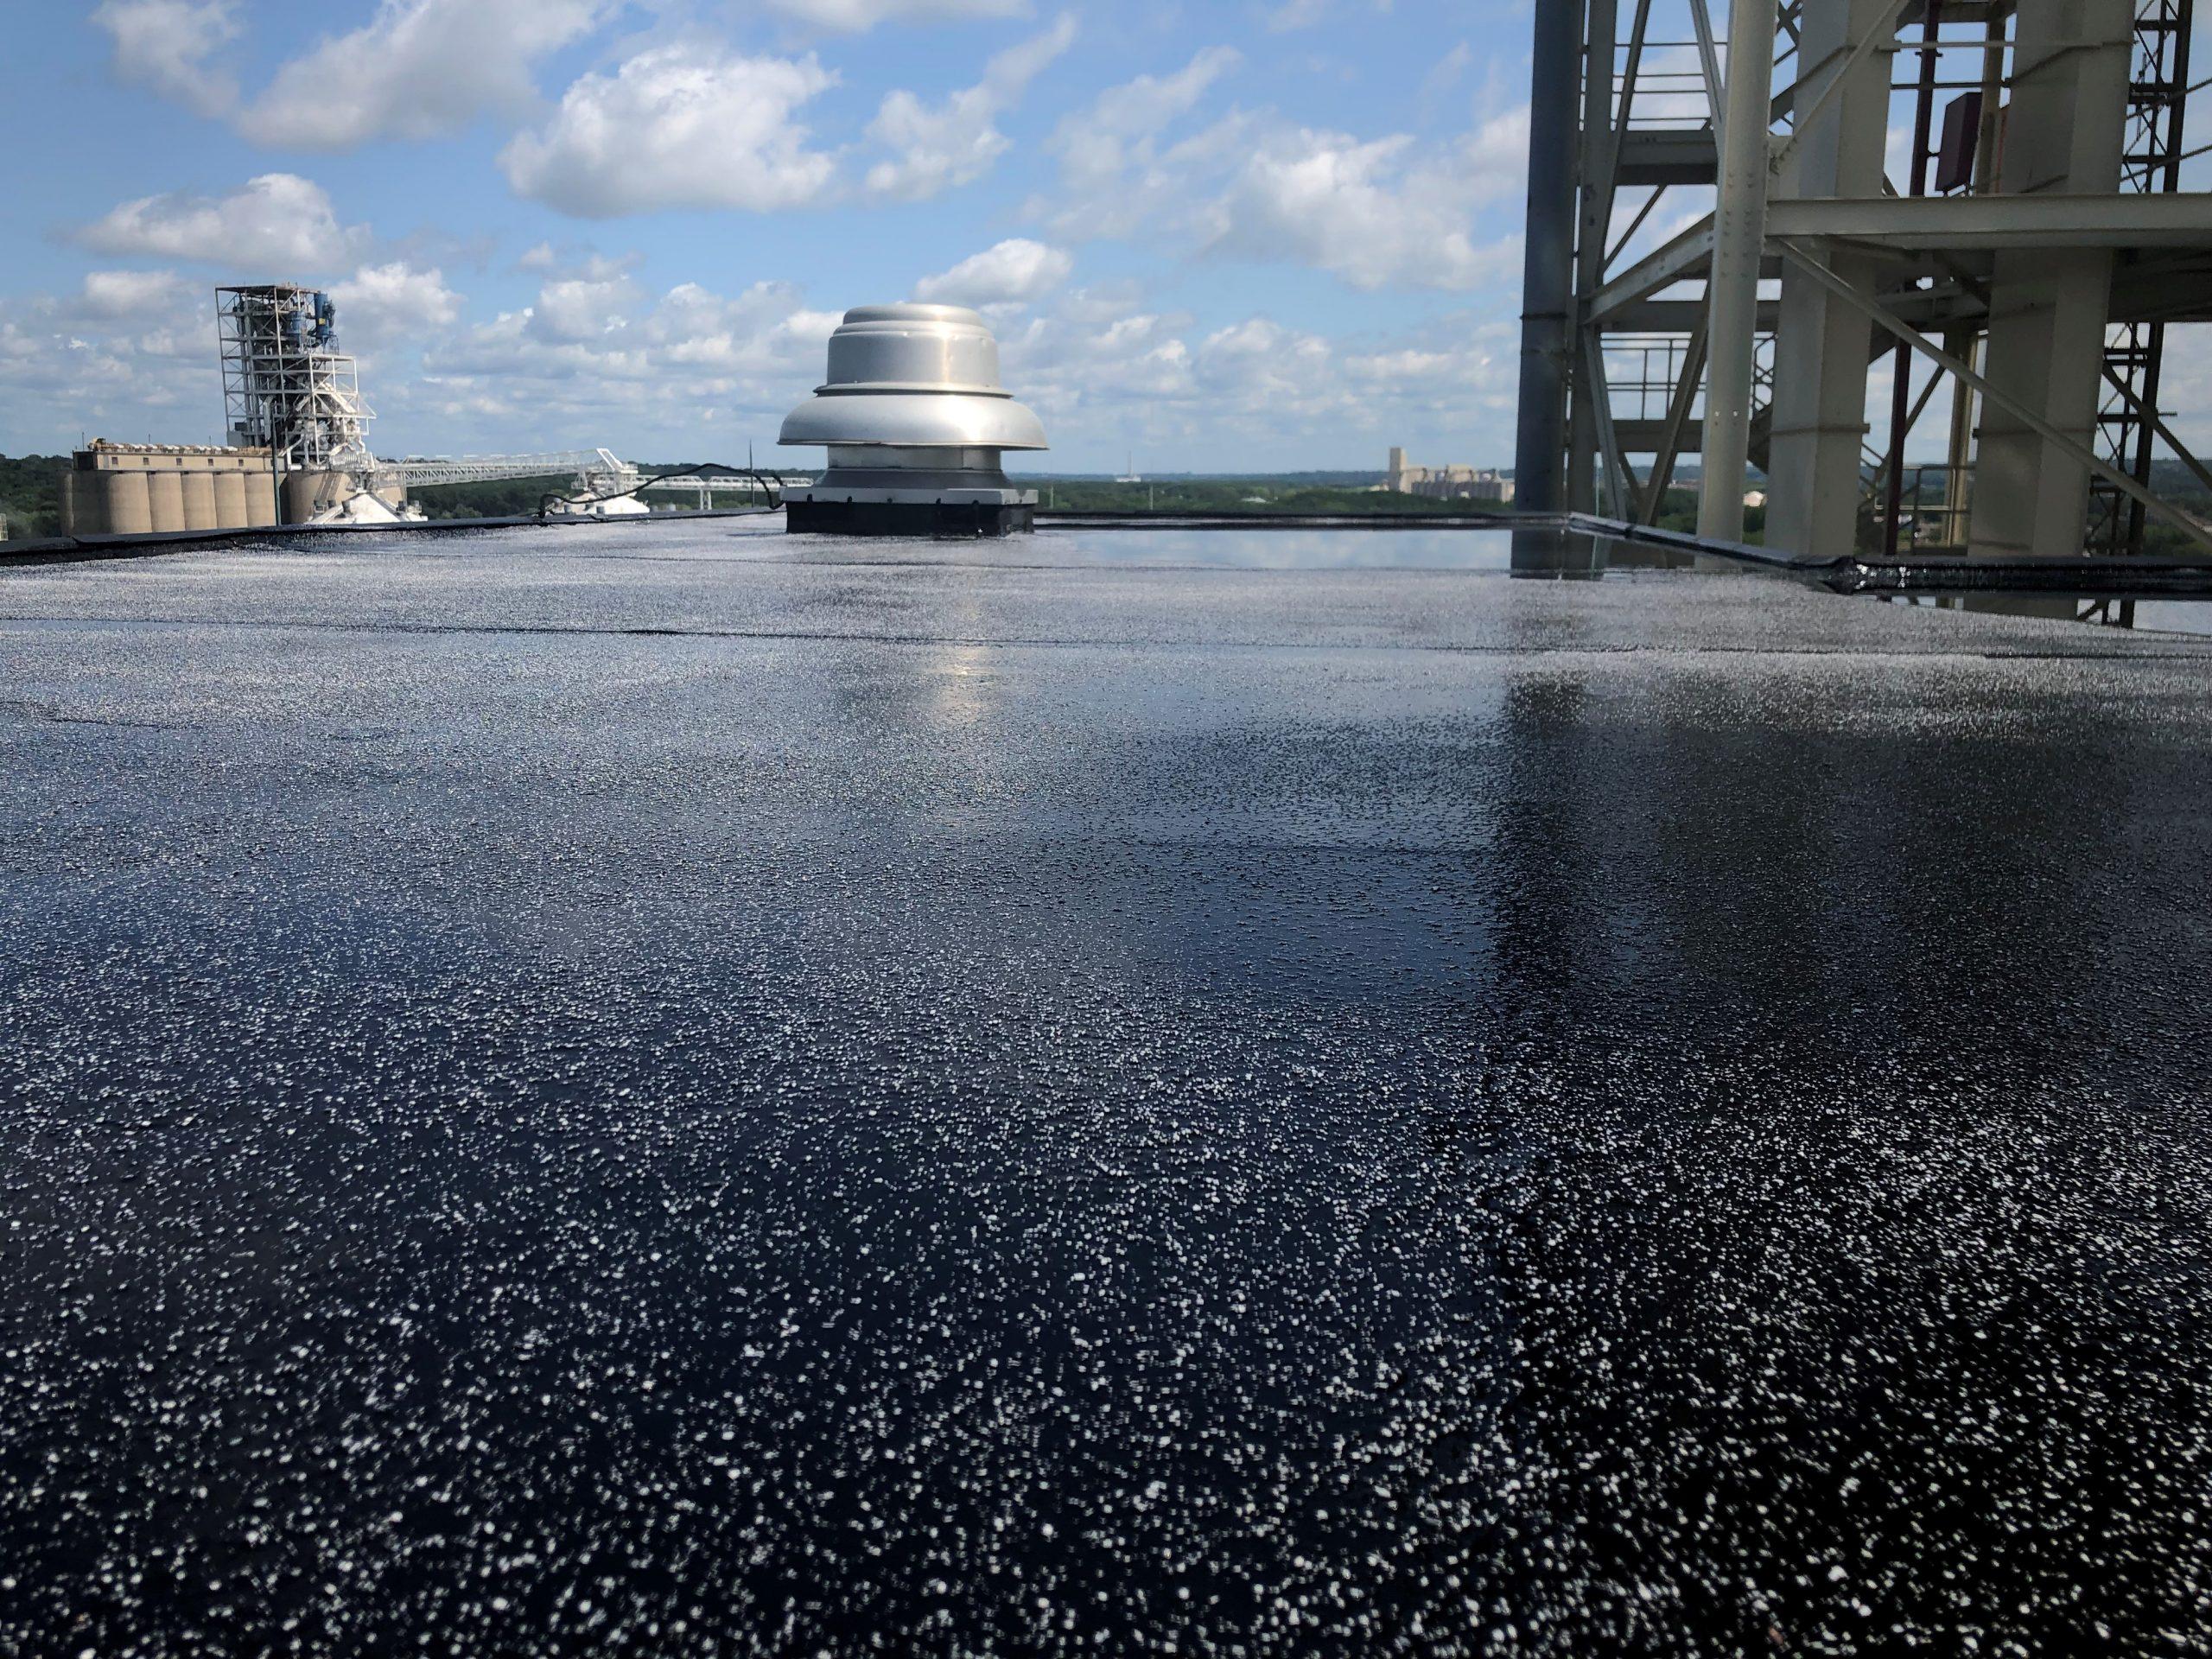 Photo Of TMI Coatings Concrete Silo Roof Project